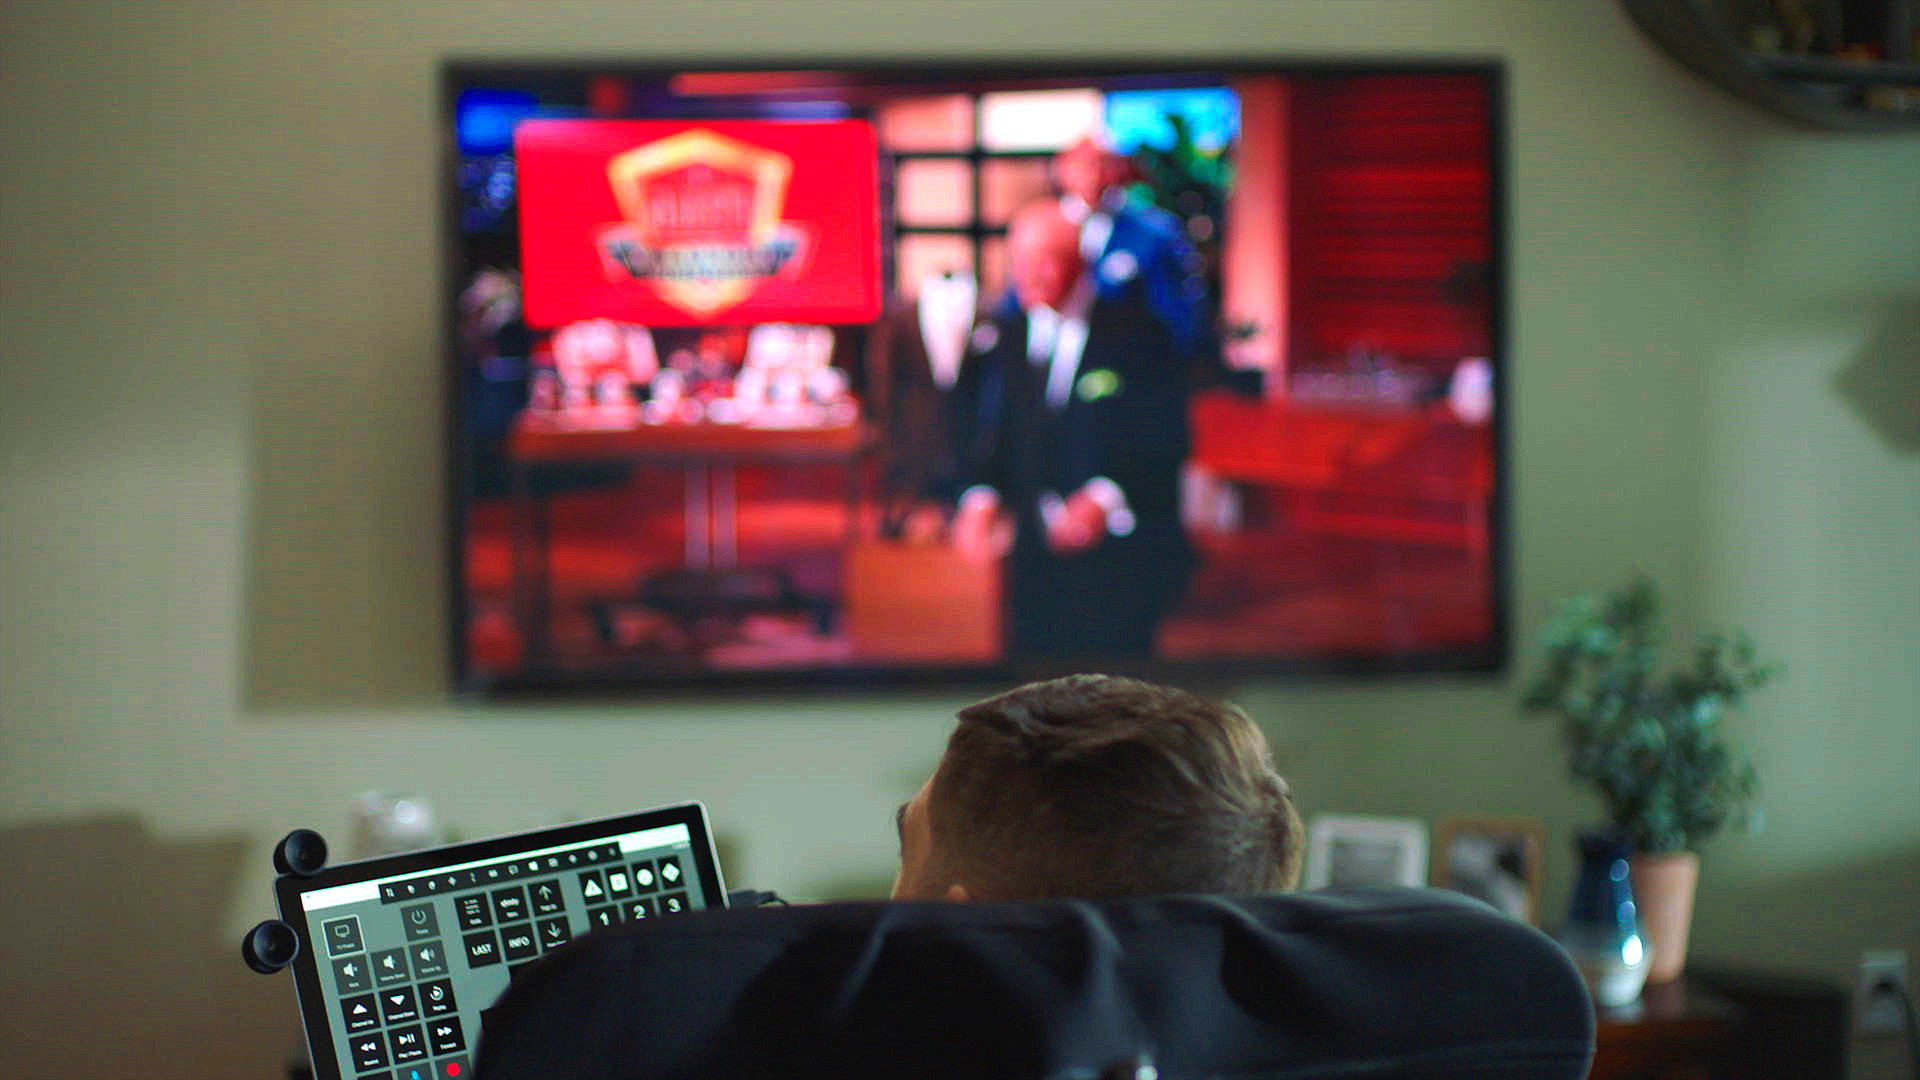 Disabled man watching eye control TV